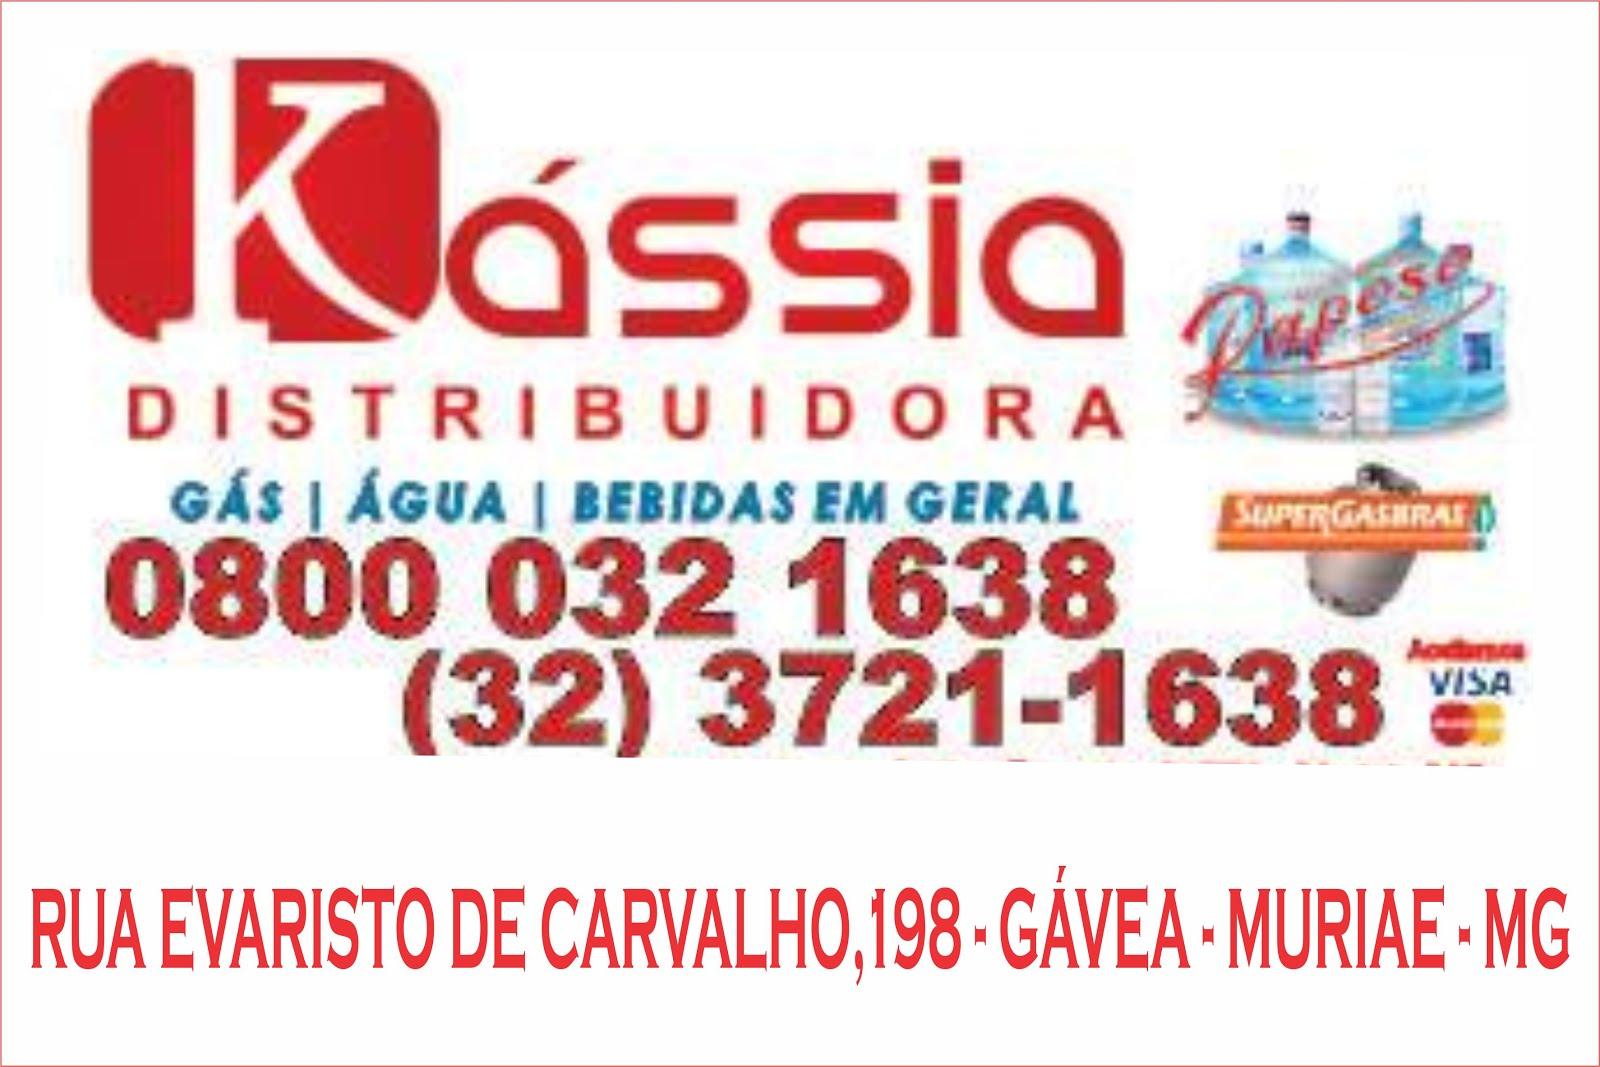 KASSIA DISTRIBUIDORA